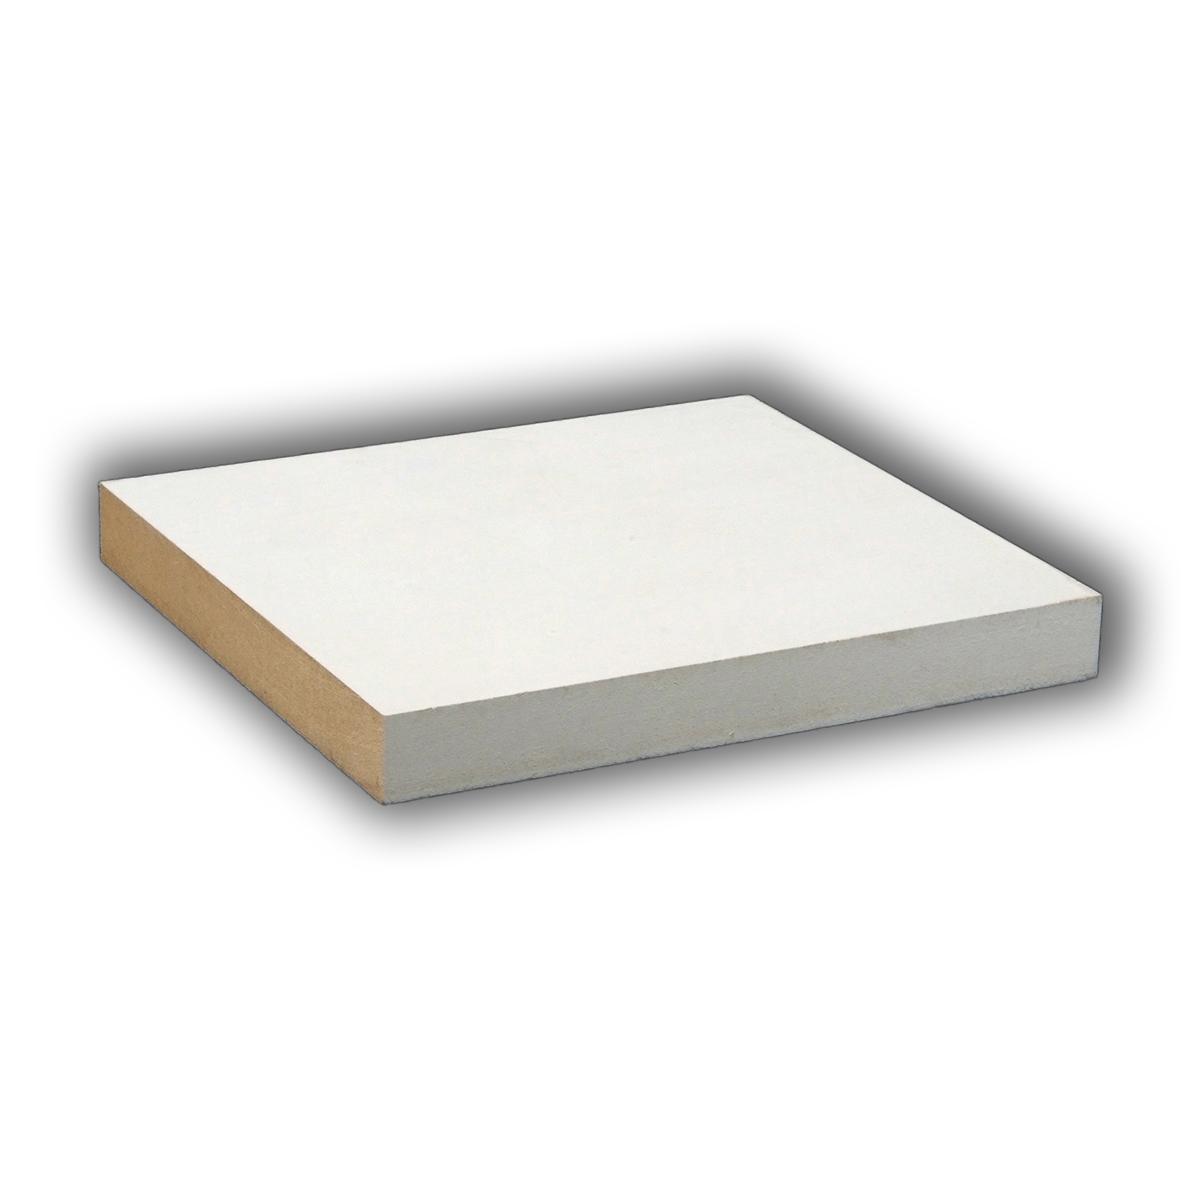 11 16 x 5 1 2 mdf board 1x6